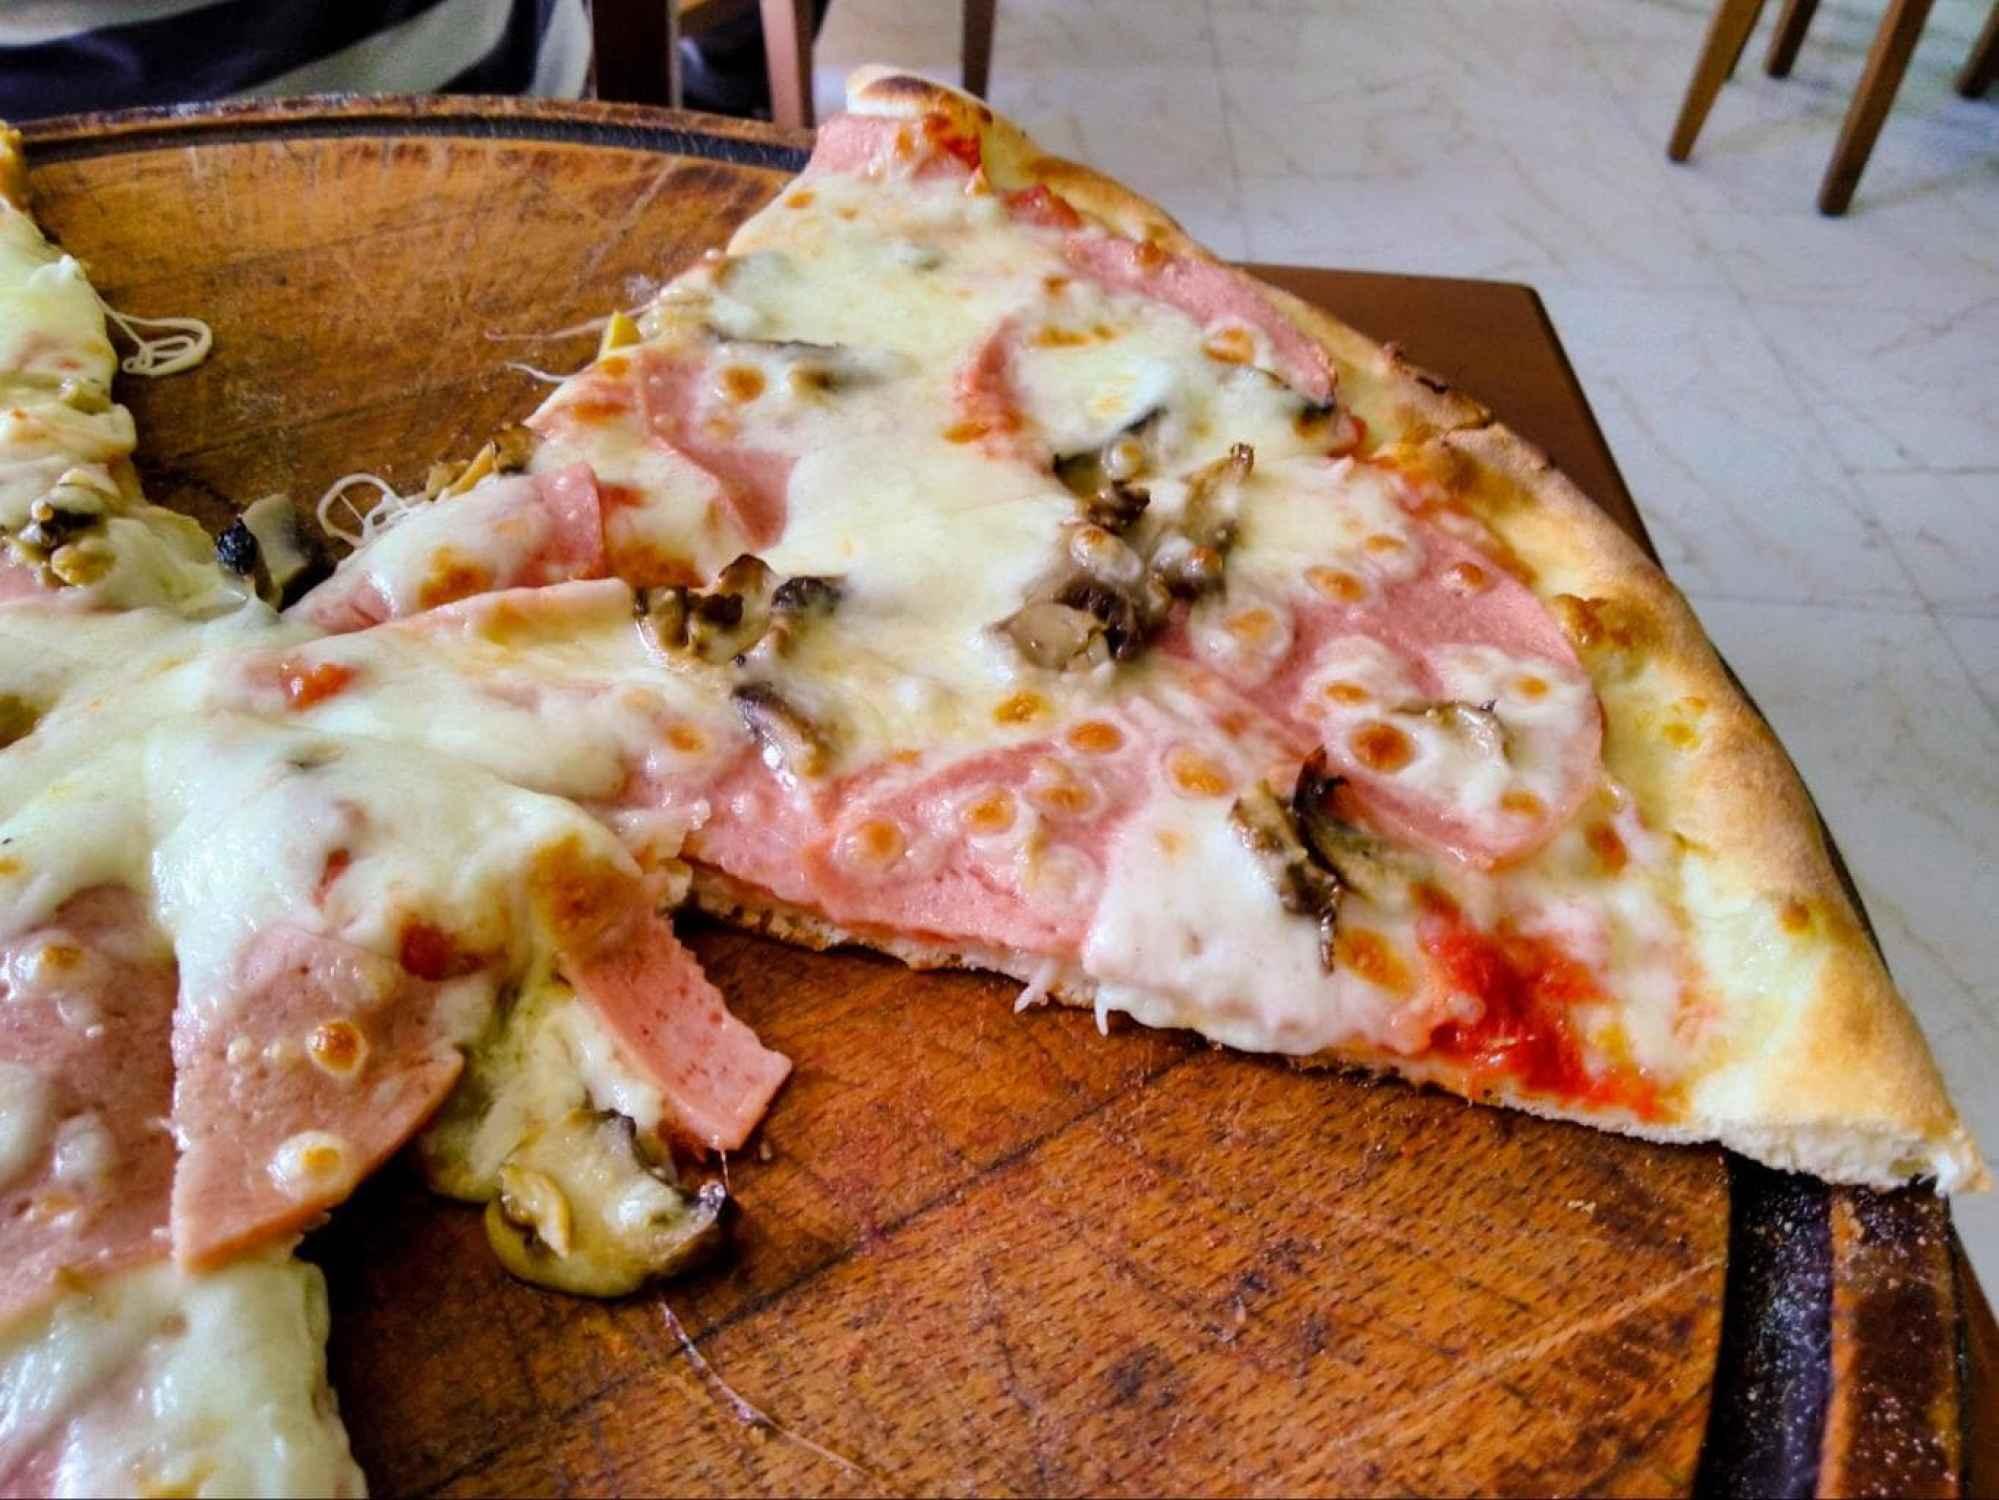 Albanian pizza, pretty much like Italian pizza